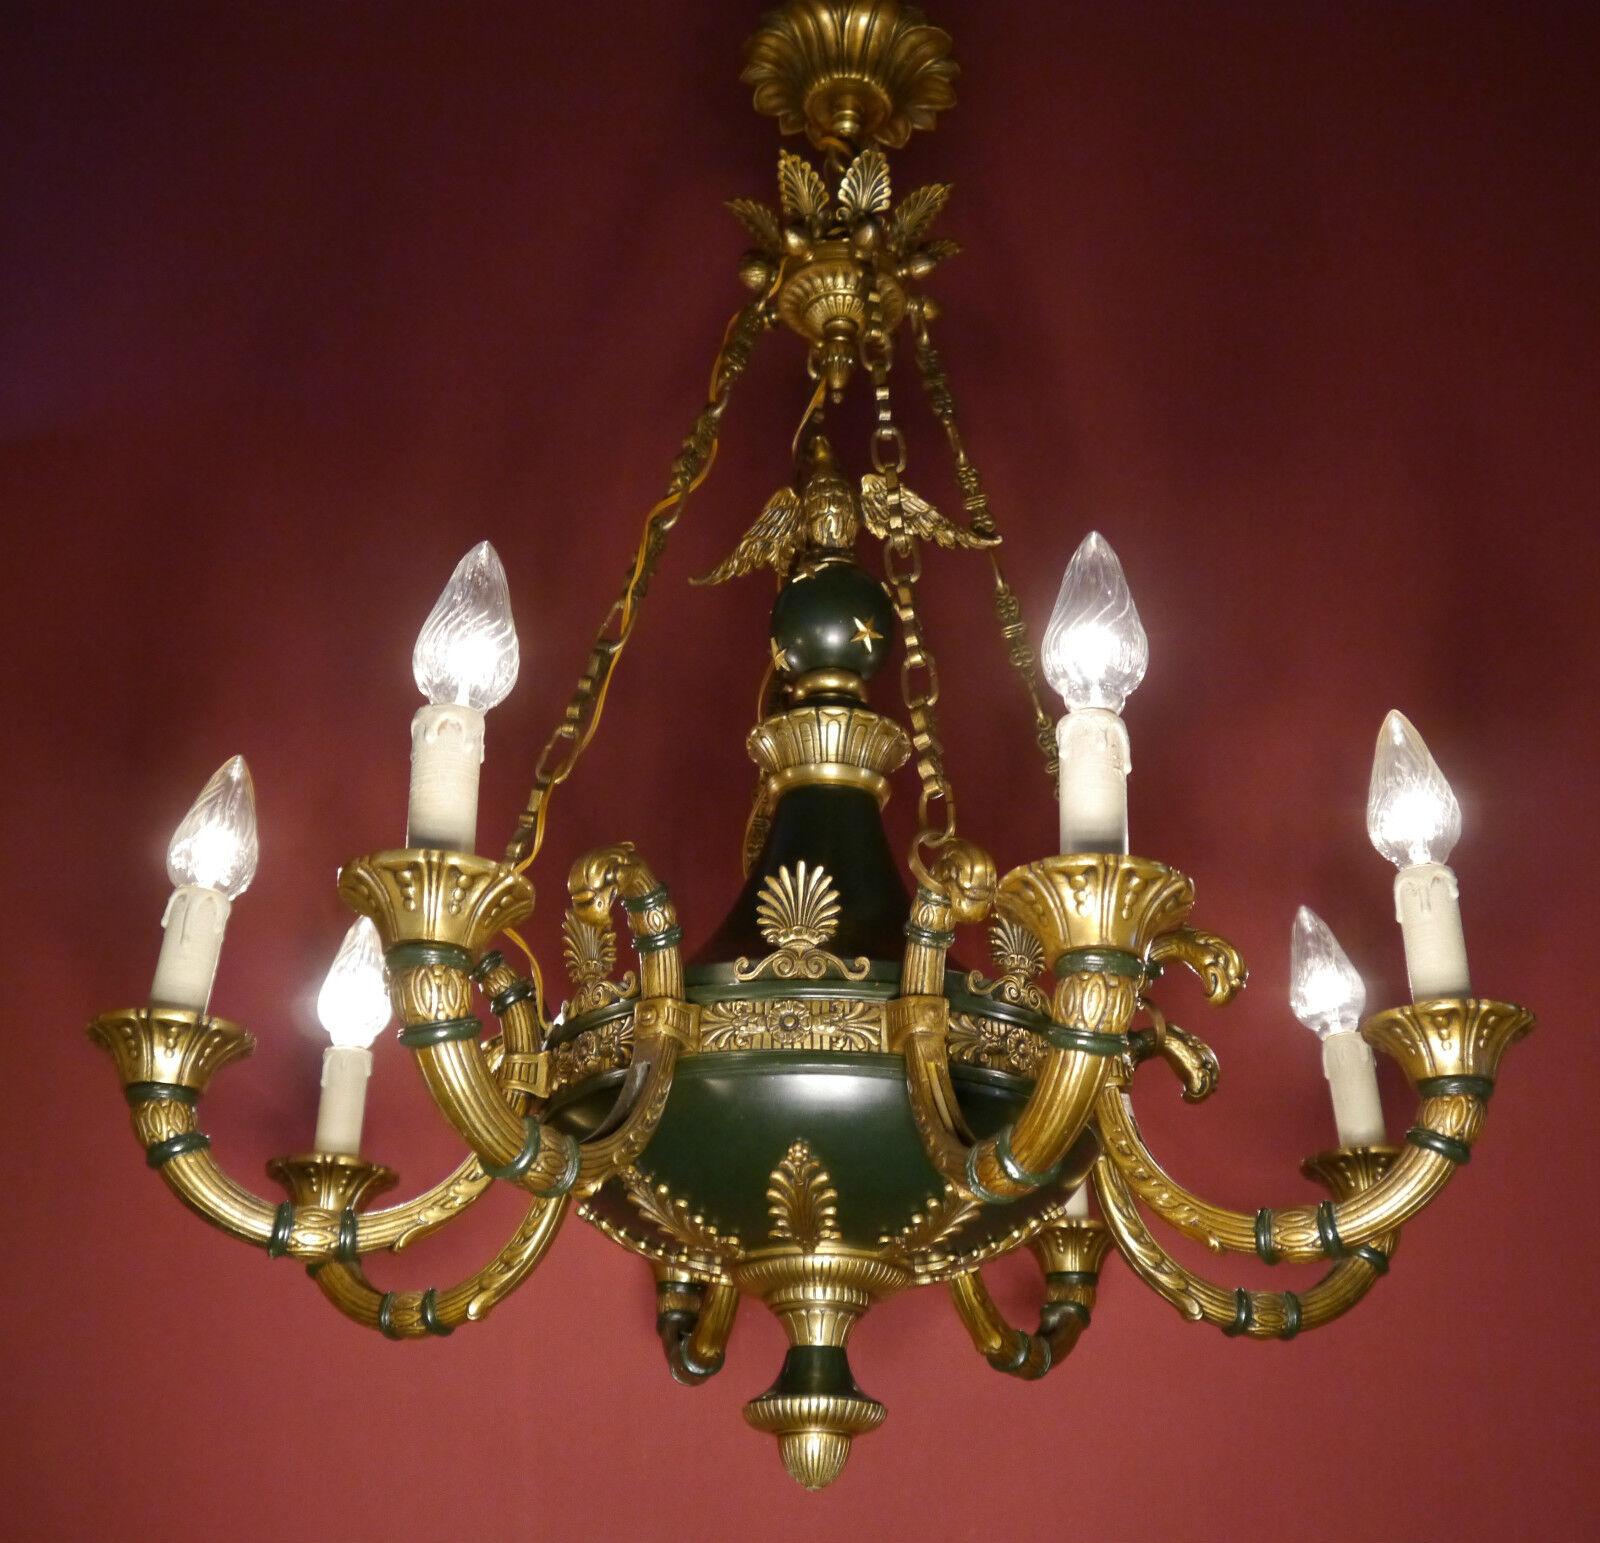 RARE BIG 8 LIGHT BRASS FRENCH EMPIRE CHANDELIER VINTAGE LAMP ANCIENT ANTIQUE